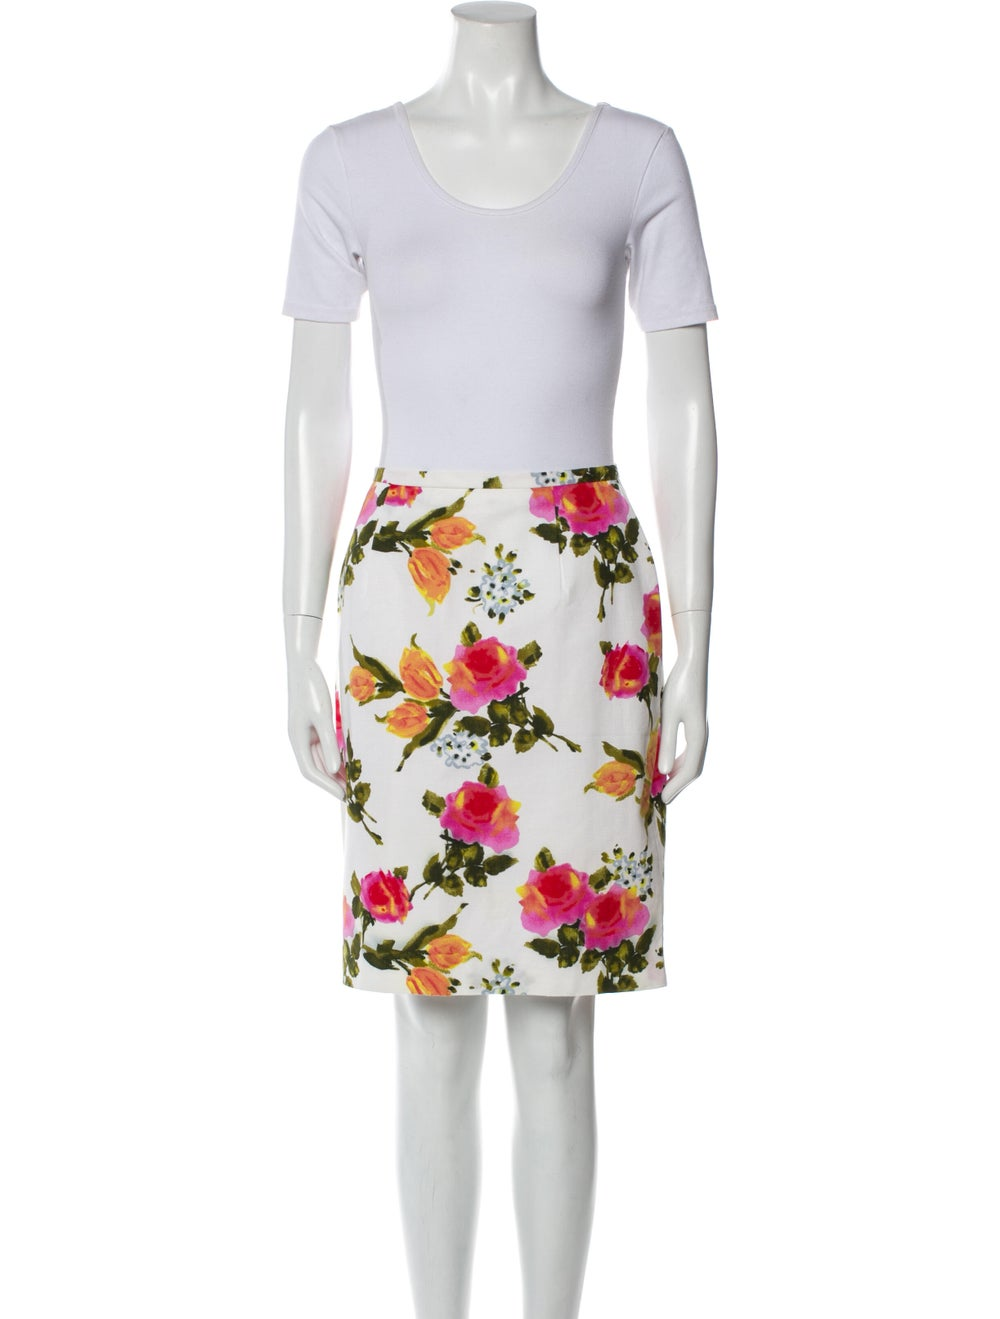 Christian Dior Vintage 1980's Skirt Set White - image 4